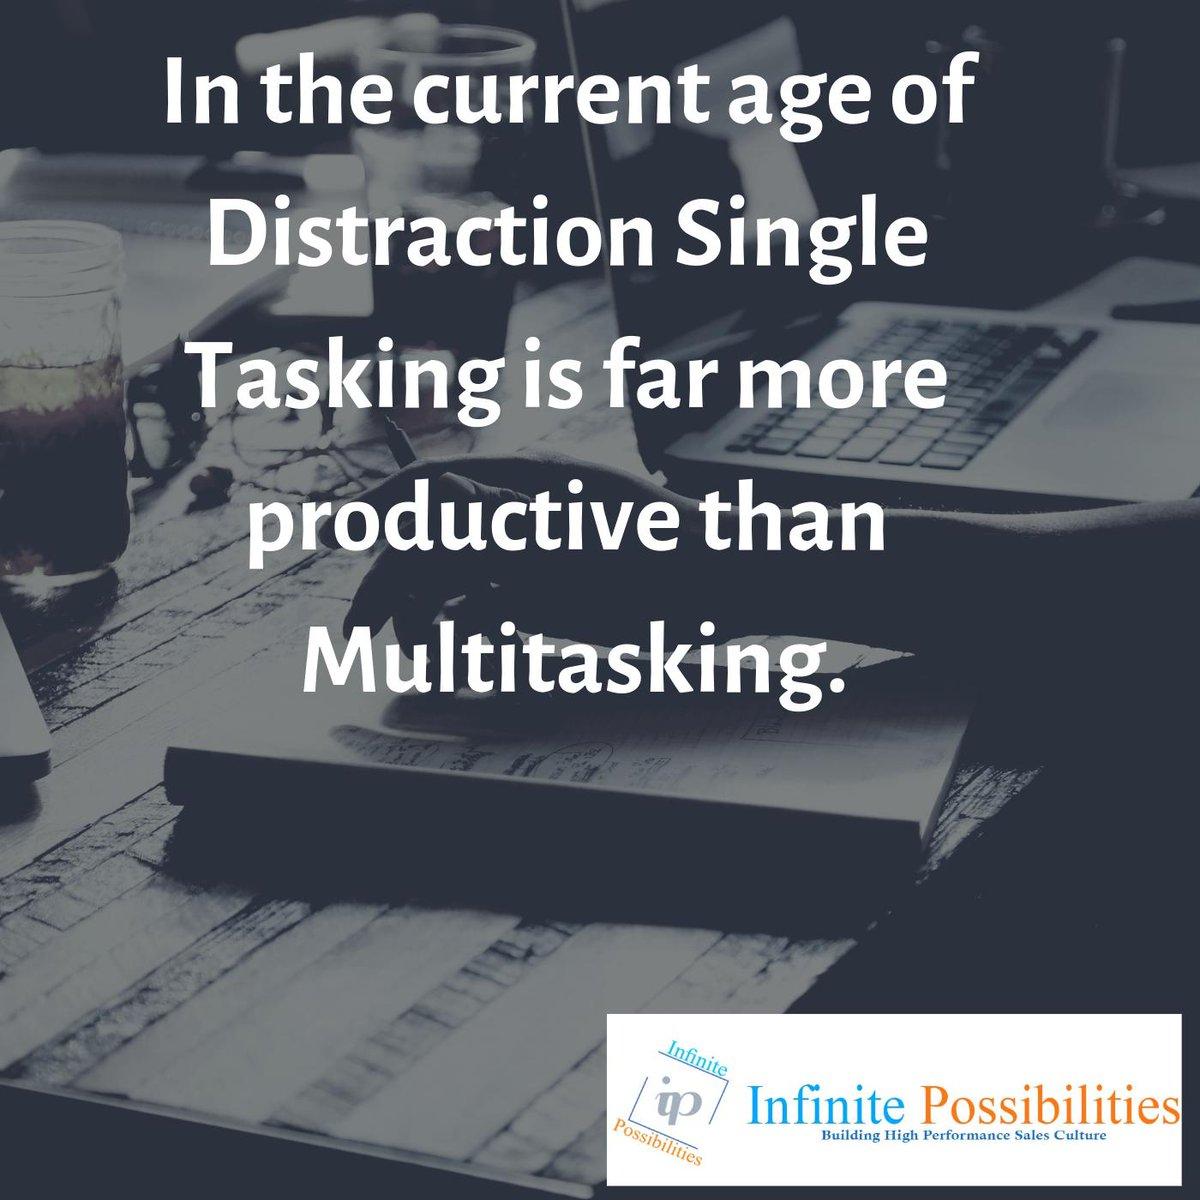 #startup  #startupsales #enterprenurship #startupadvise #Infinitepossibilities #Prabodhdeolekar #salesenablement #salestraining #productivity #personaldevelopment #selfhelp #multitasking #focus #salescoaching